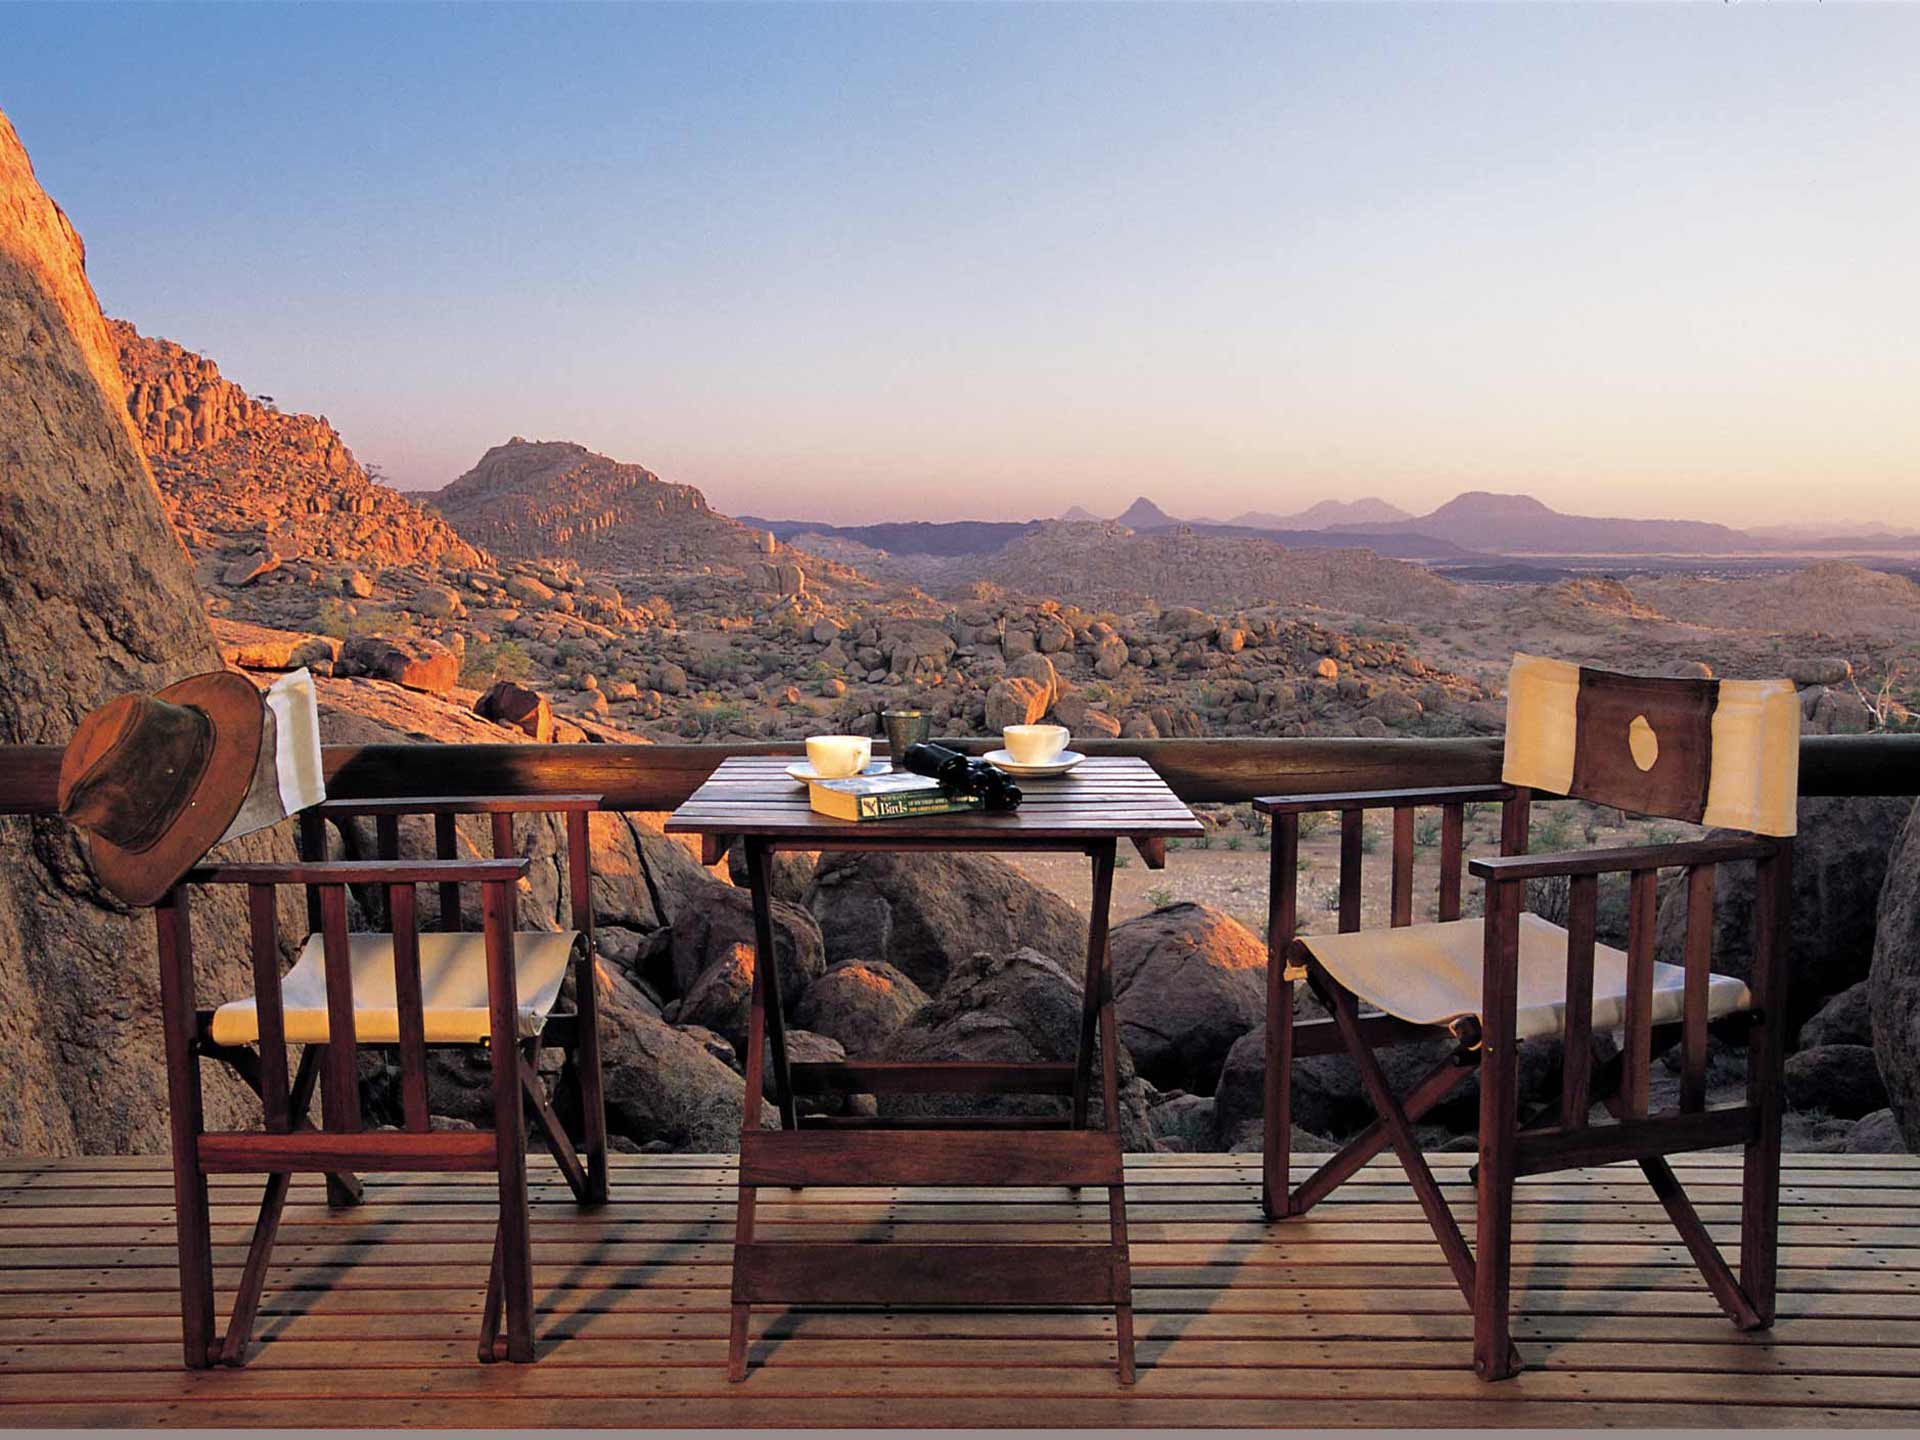 Mowani Mountain Camp im Damaraland Tisch Kaffee Sonnenuntergang Namibias Norden